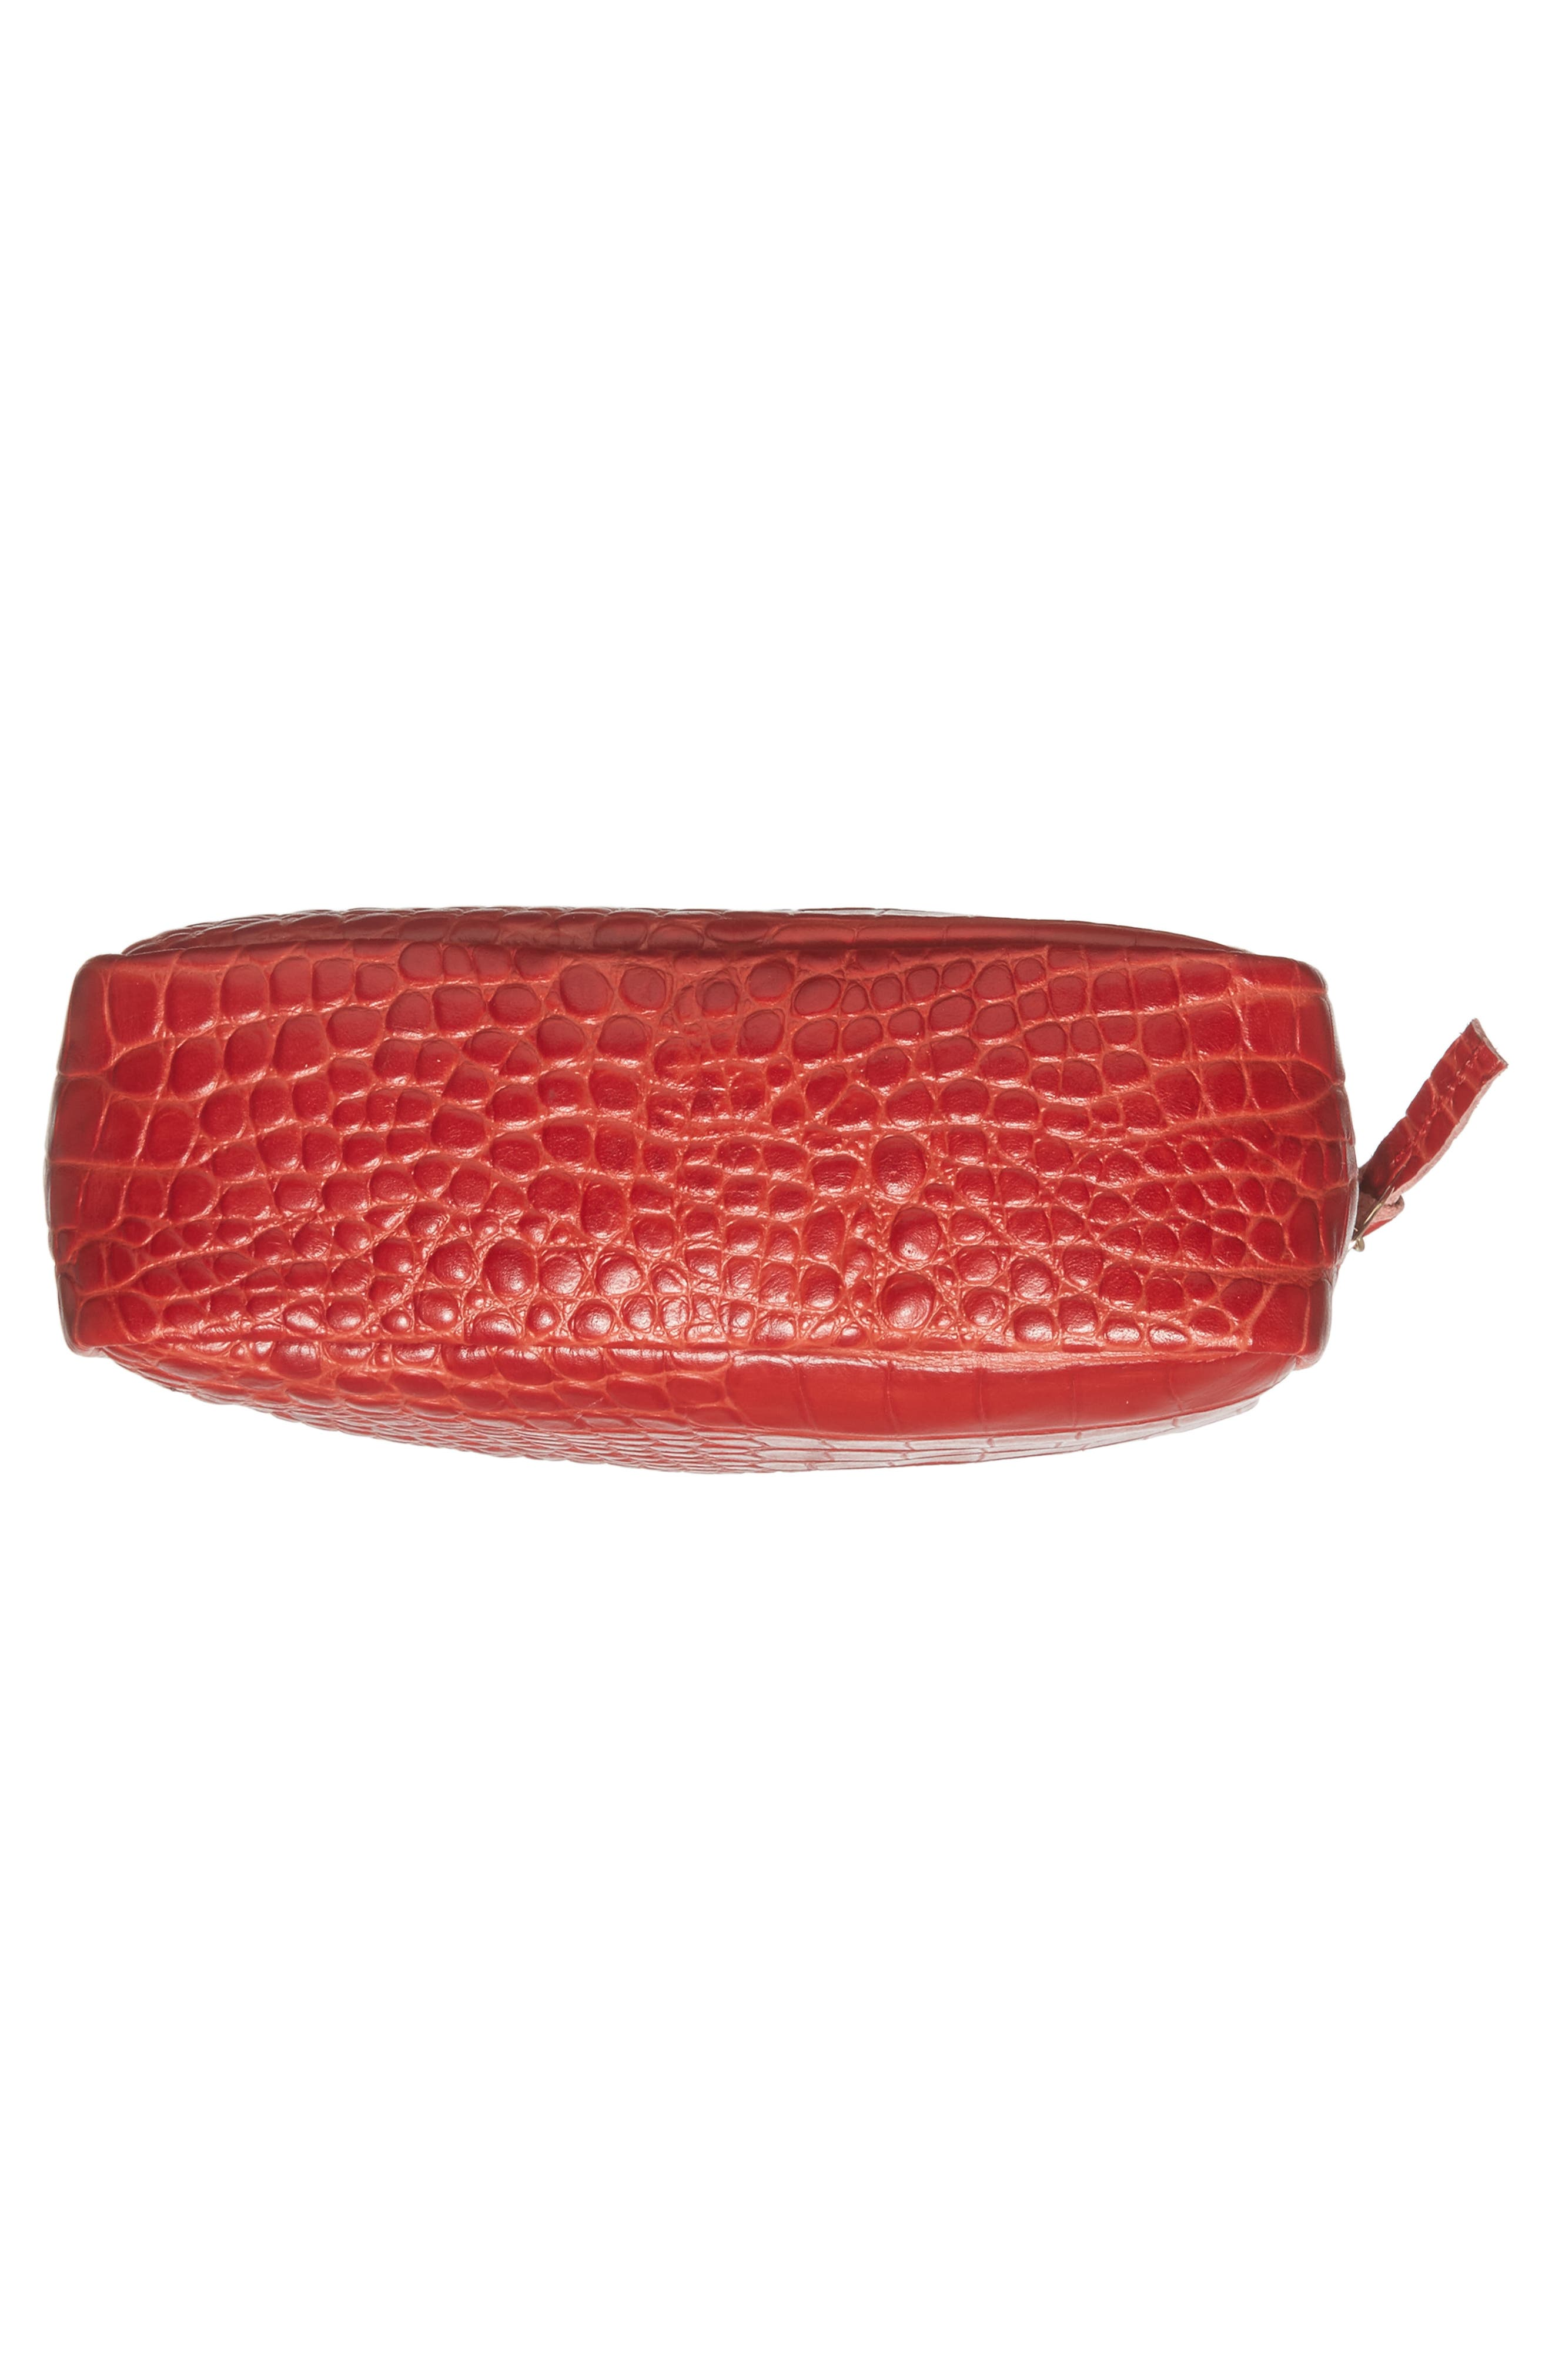 Midi Sac Supreme Croc Embossed Leather Crossbody Bag,                             Alternate thumbnail 6, color,                             600